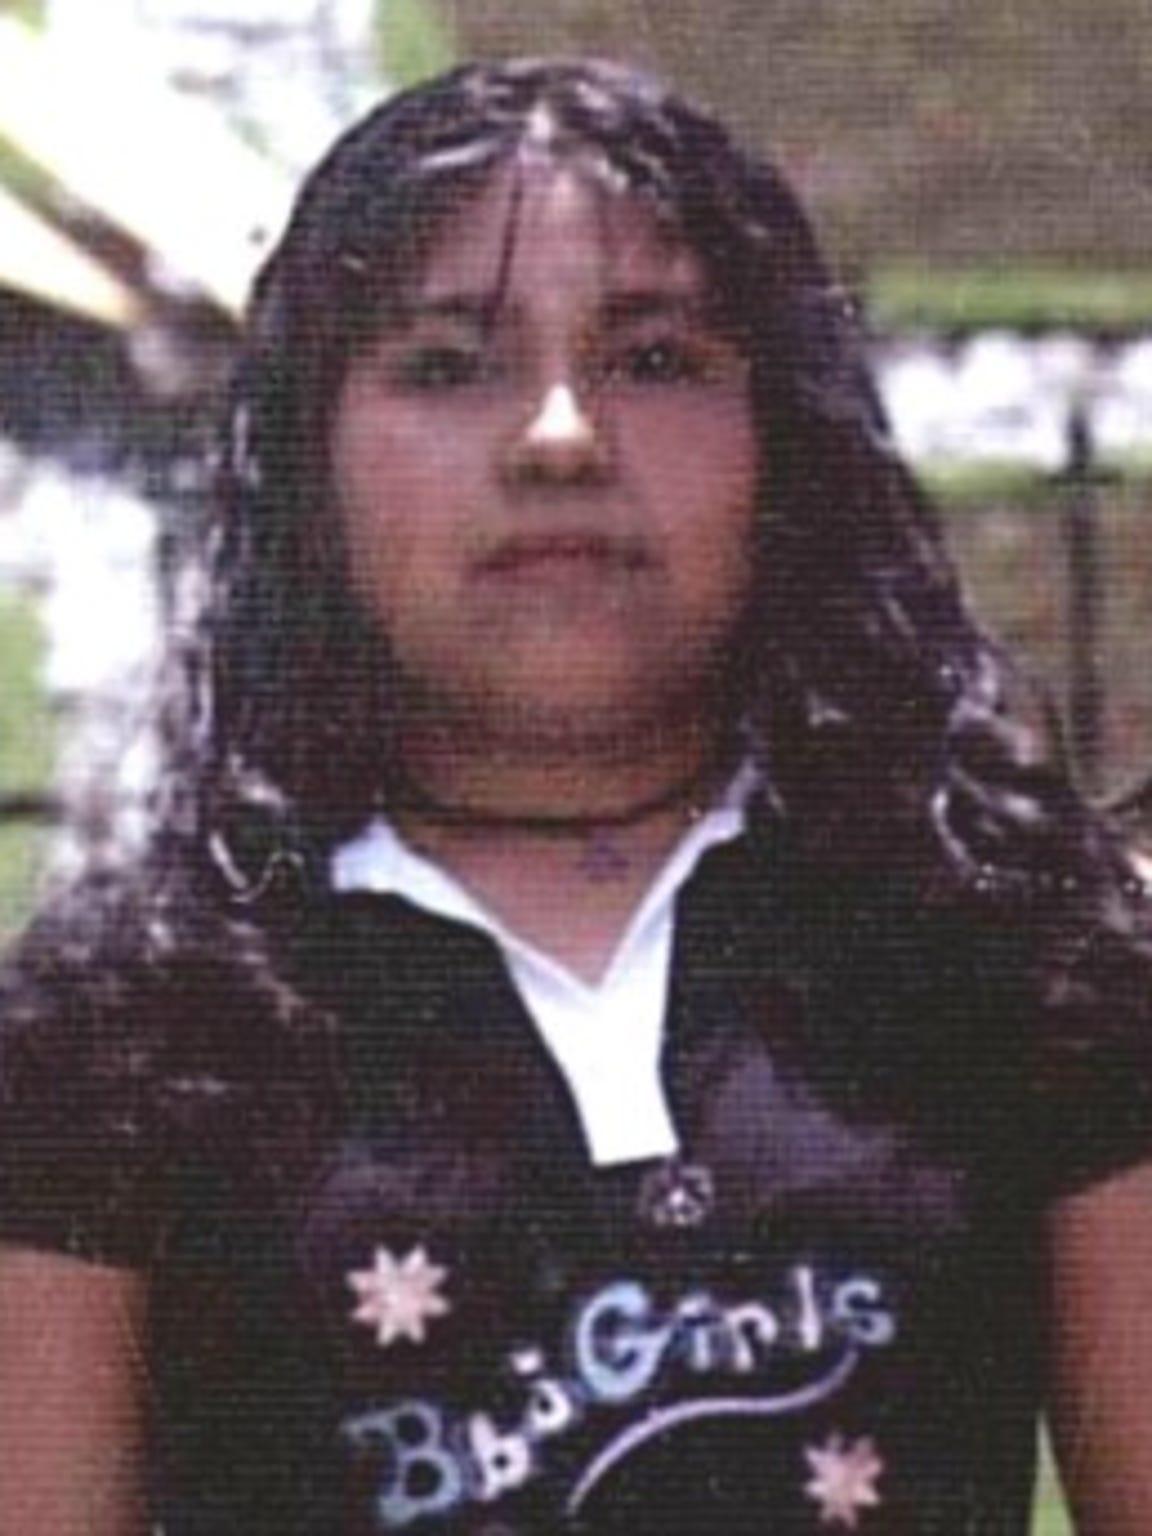 Claudia Gutierrez Cruz was killed while walking from